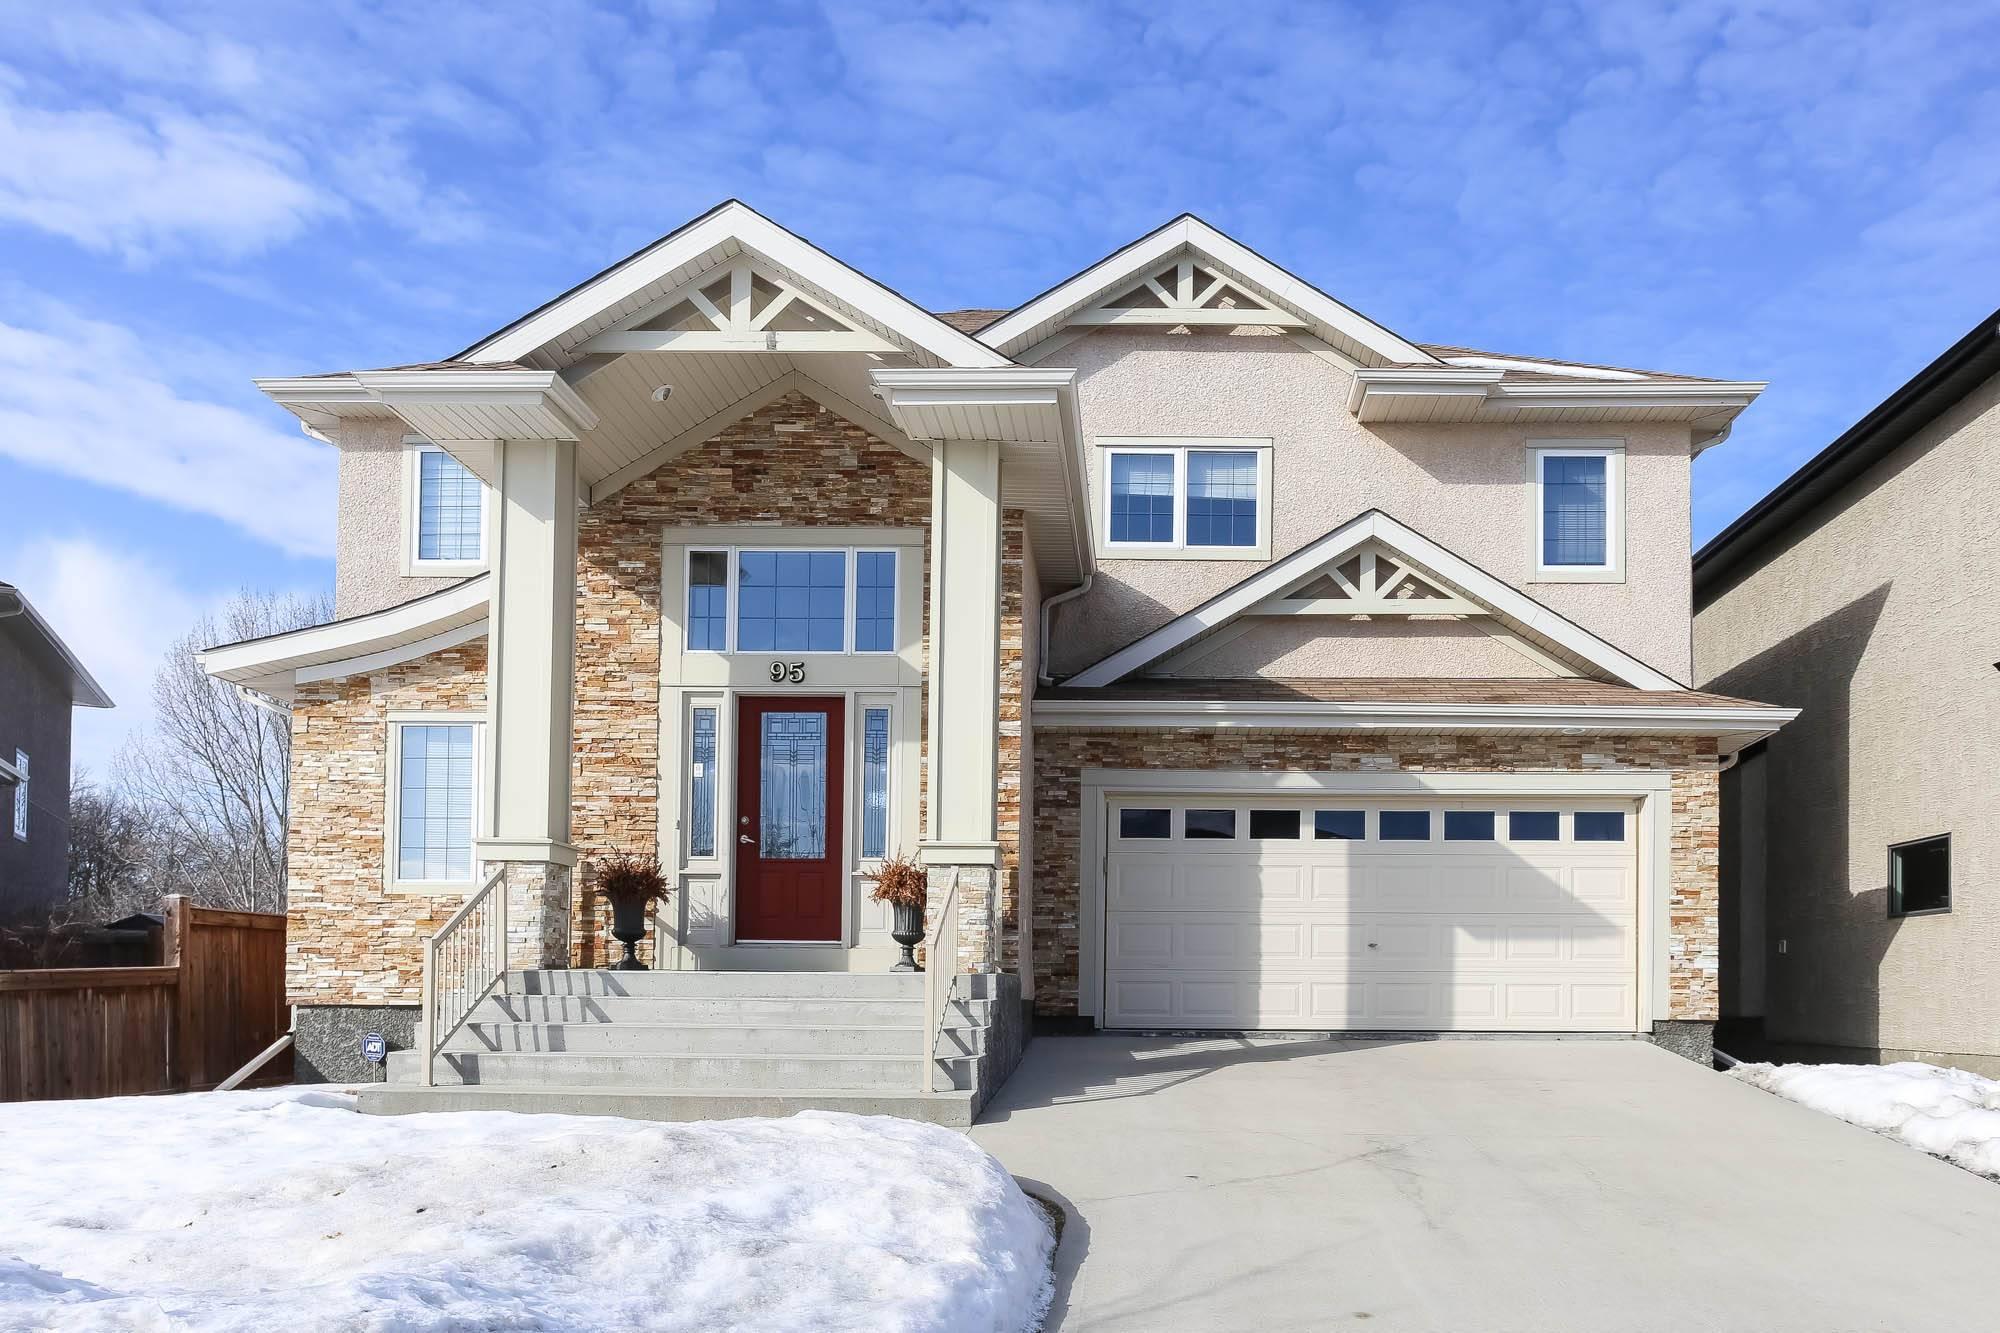 95 Portside Drive, Winnipeg, Manitoba  R2N 0C8 - Photo 38 - 202004300